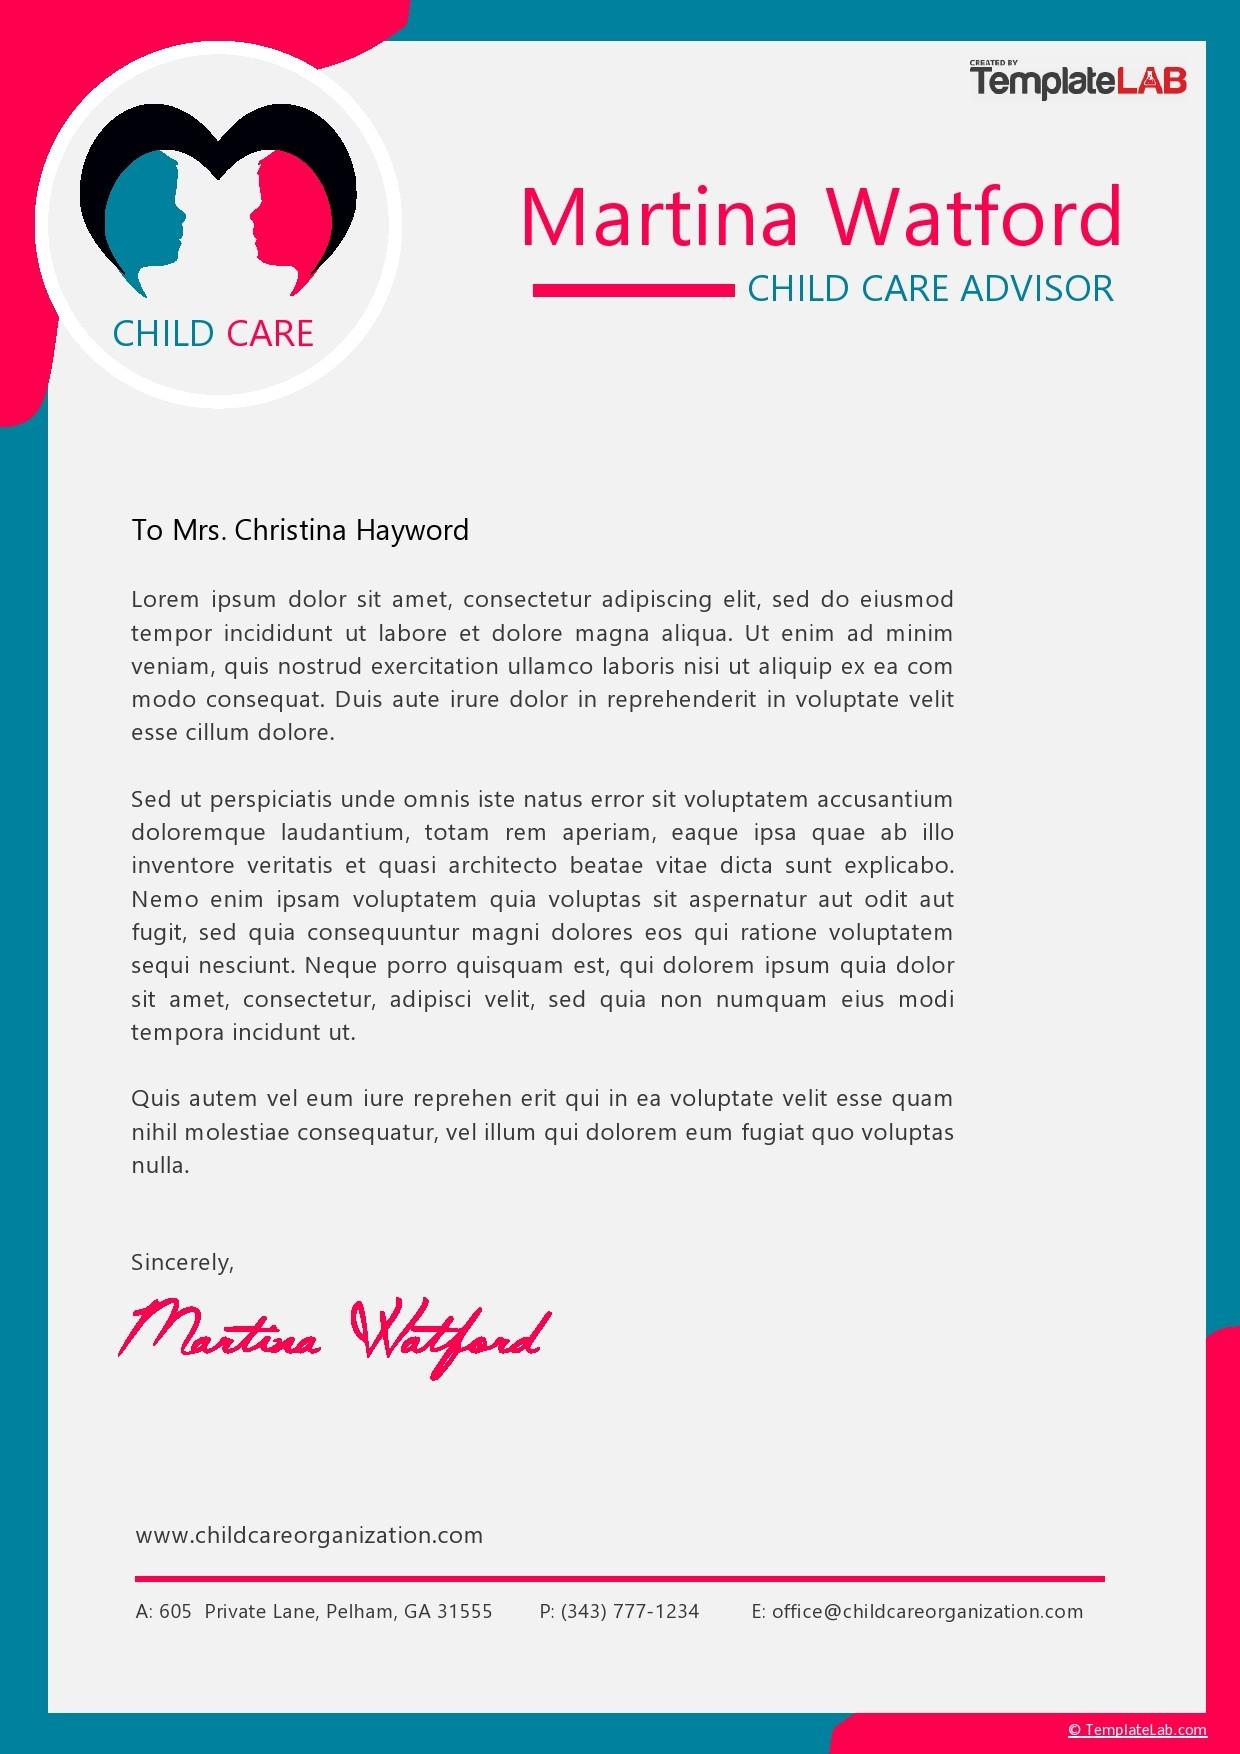 Free Child Care Letterhead Template - TemplateLab.com